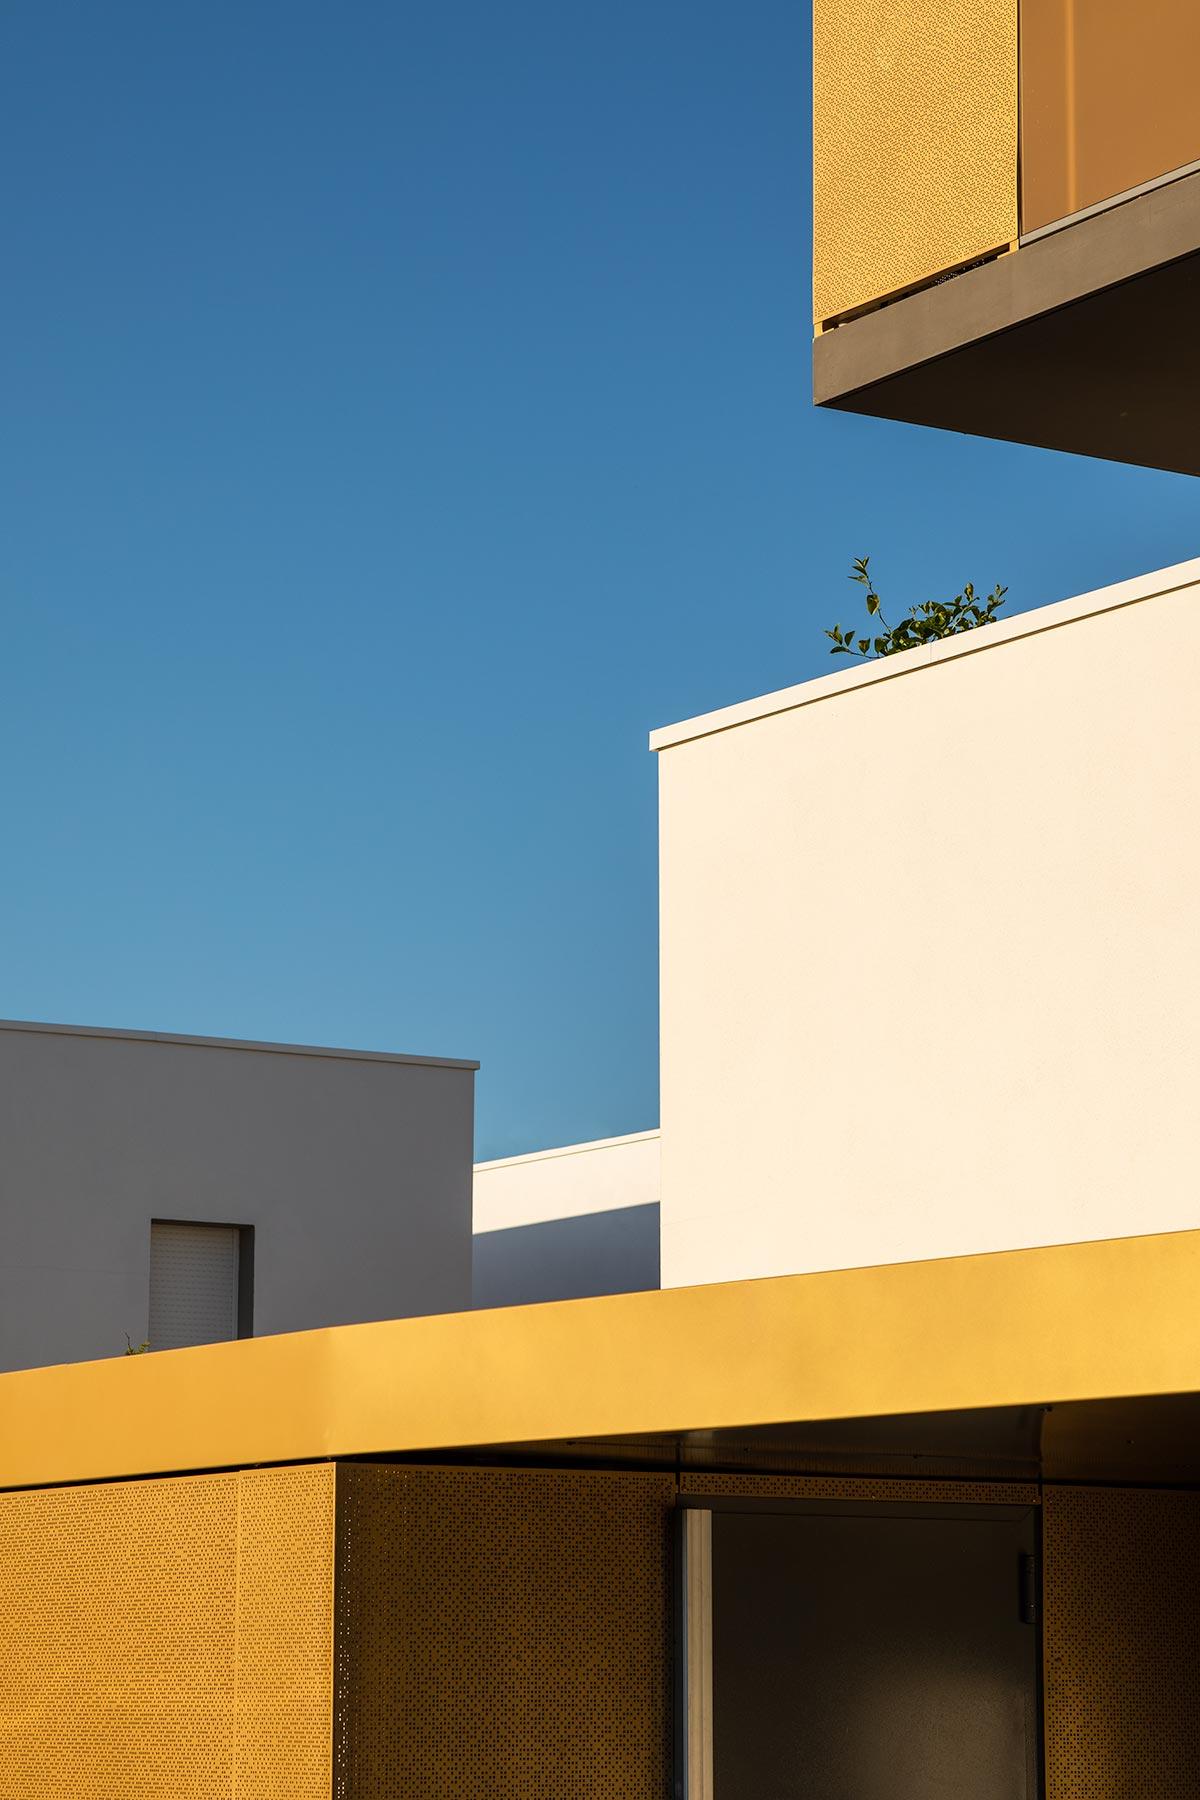 Photographe architecture ambiance couchant abstrait